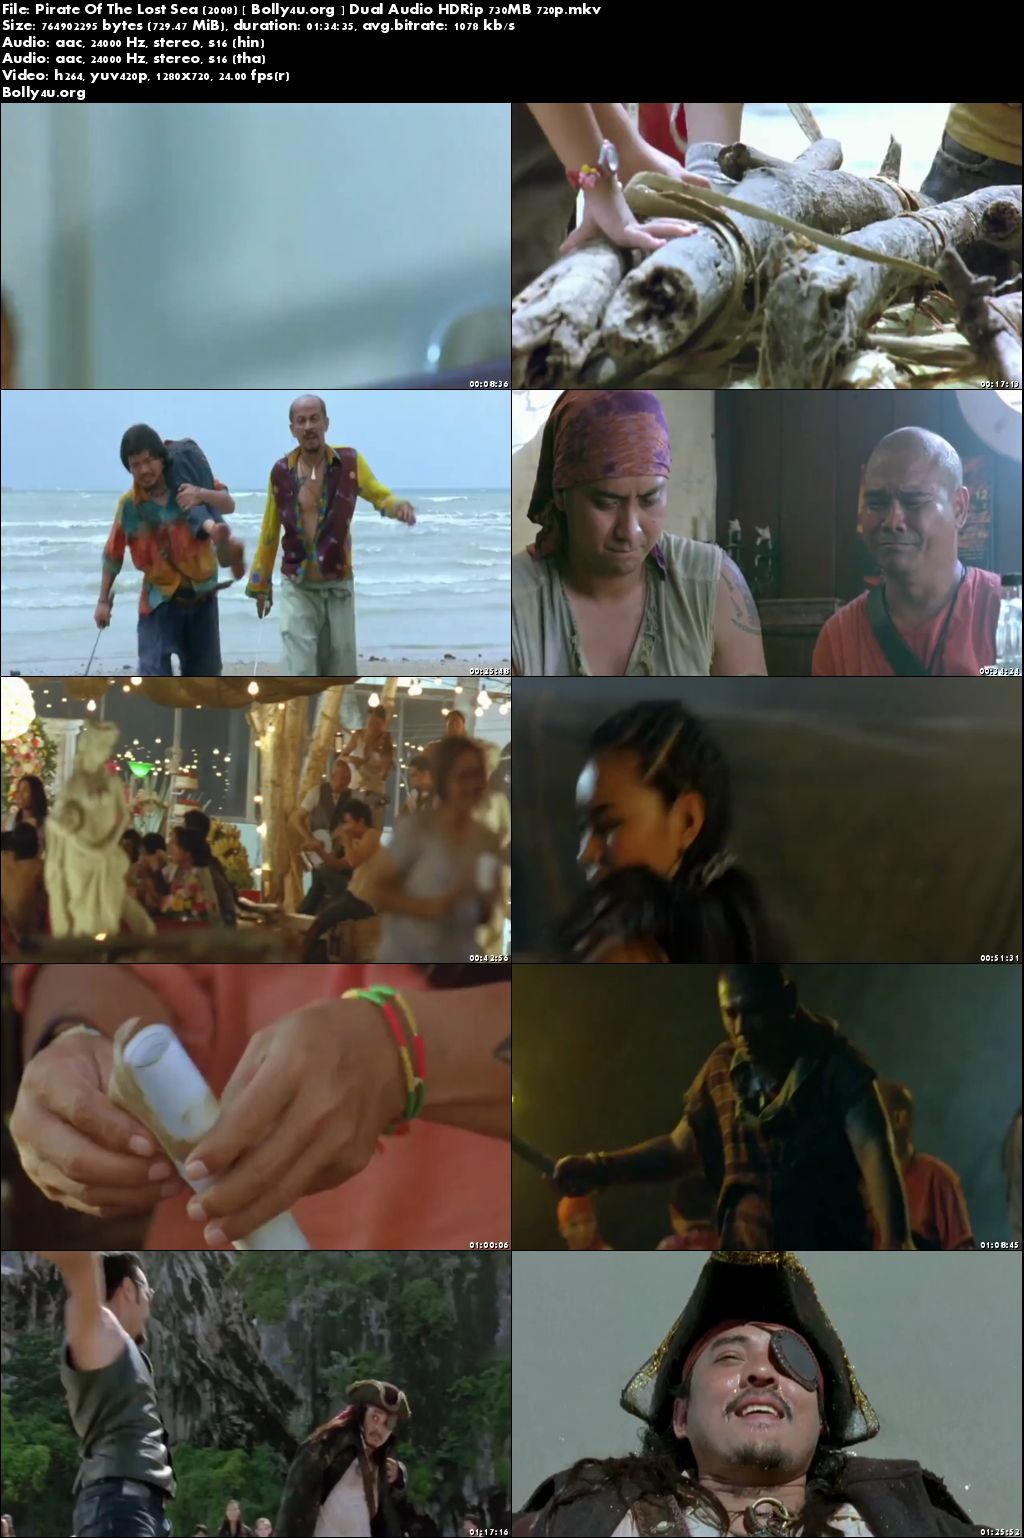 Pirate Of The Lost Sea 2008 HDRip 700MB Hindi Dual Audio 720p Download